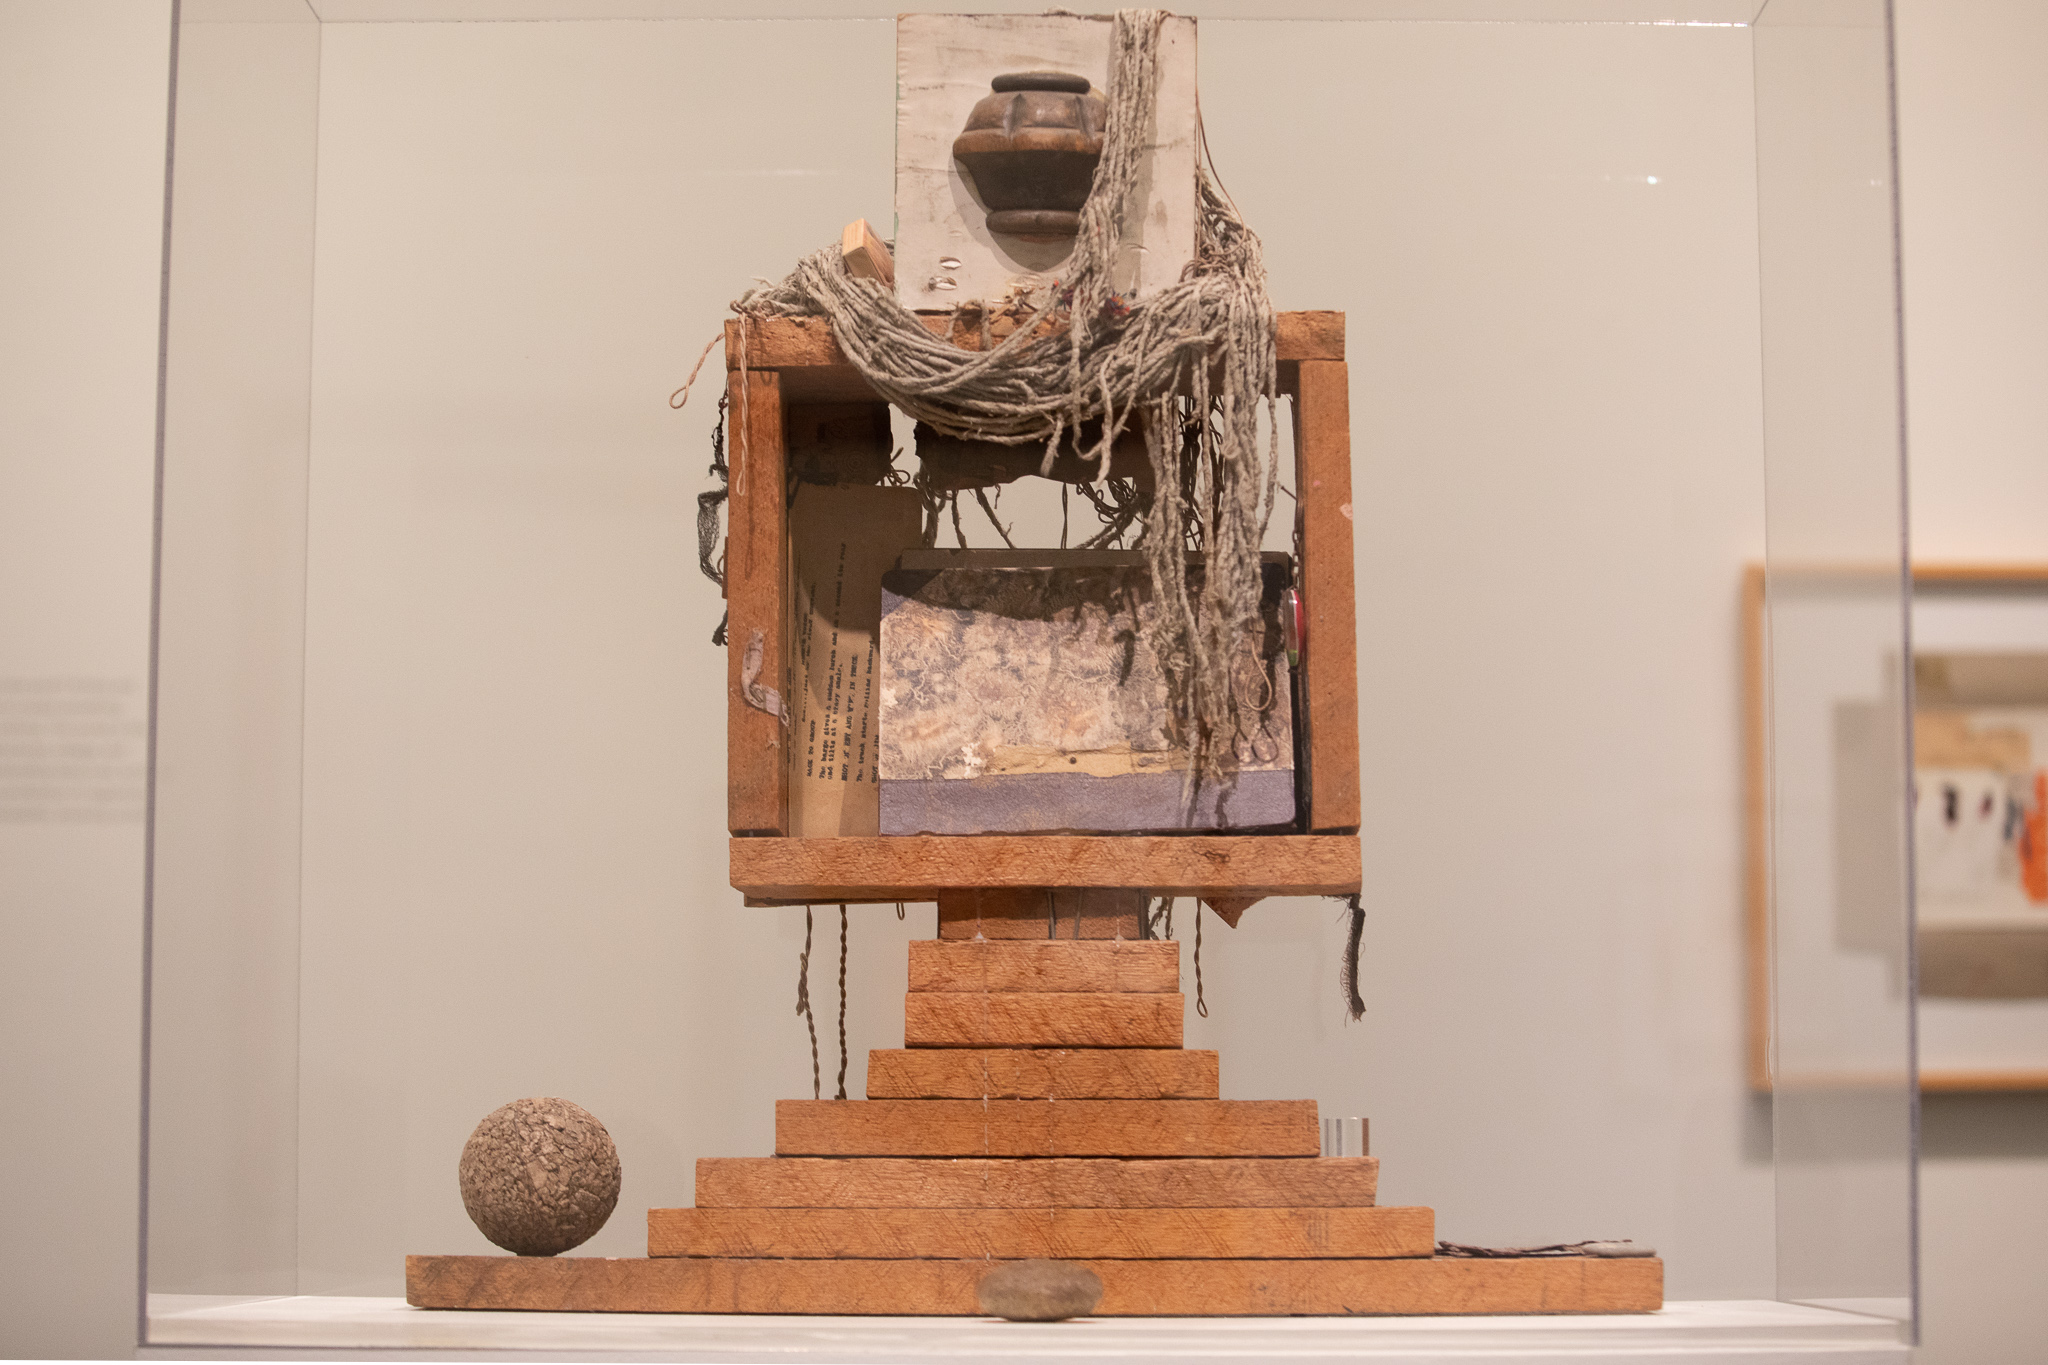 U2A3833 - Sheldon art exhibition shows waste drives human life